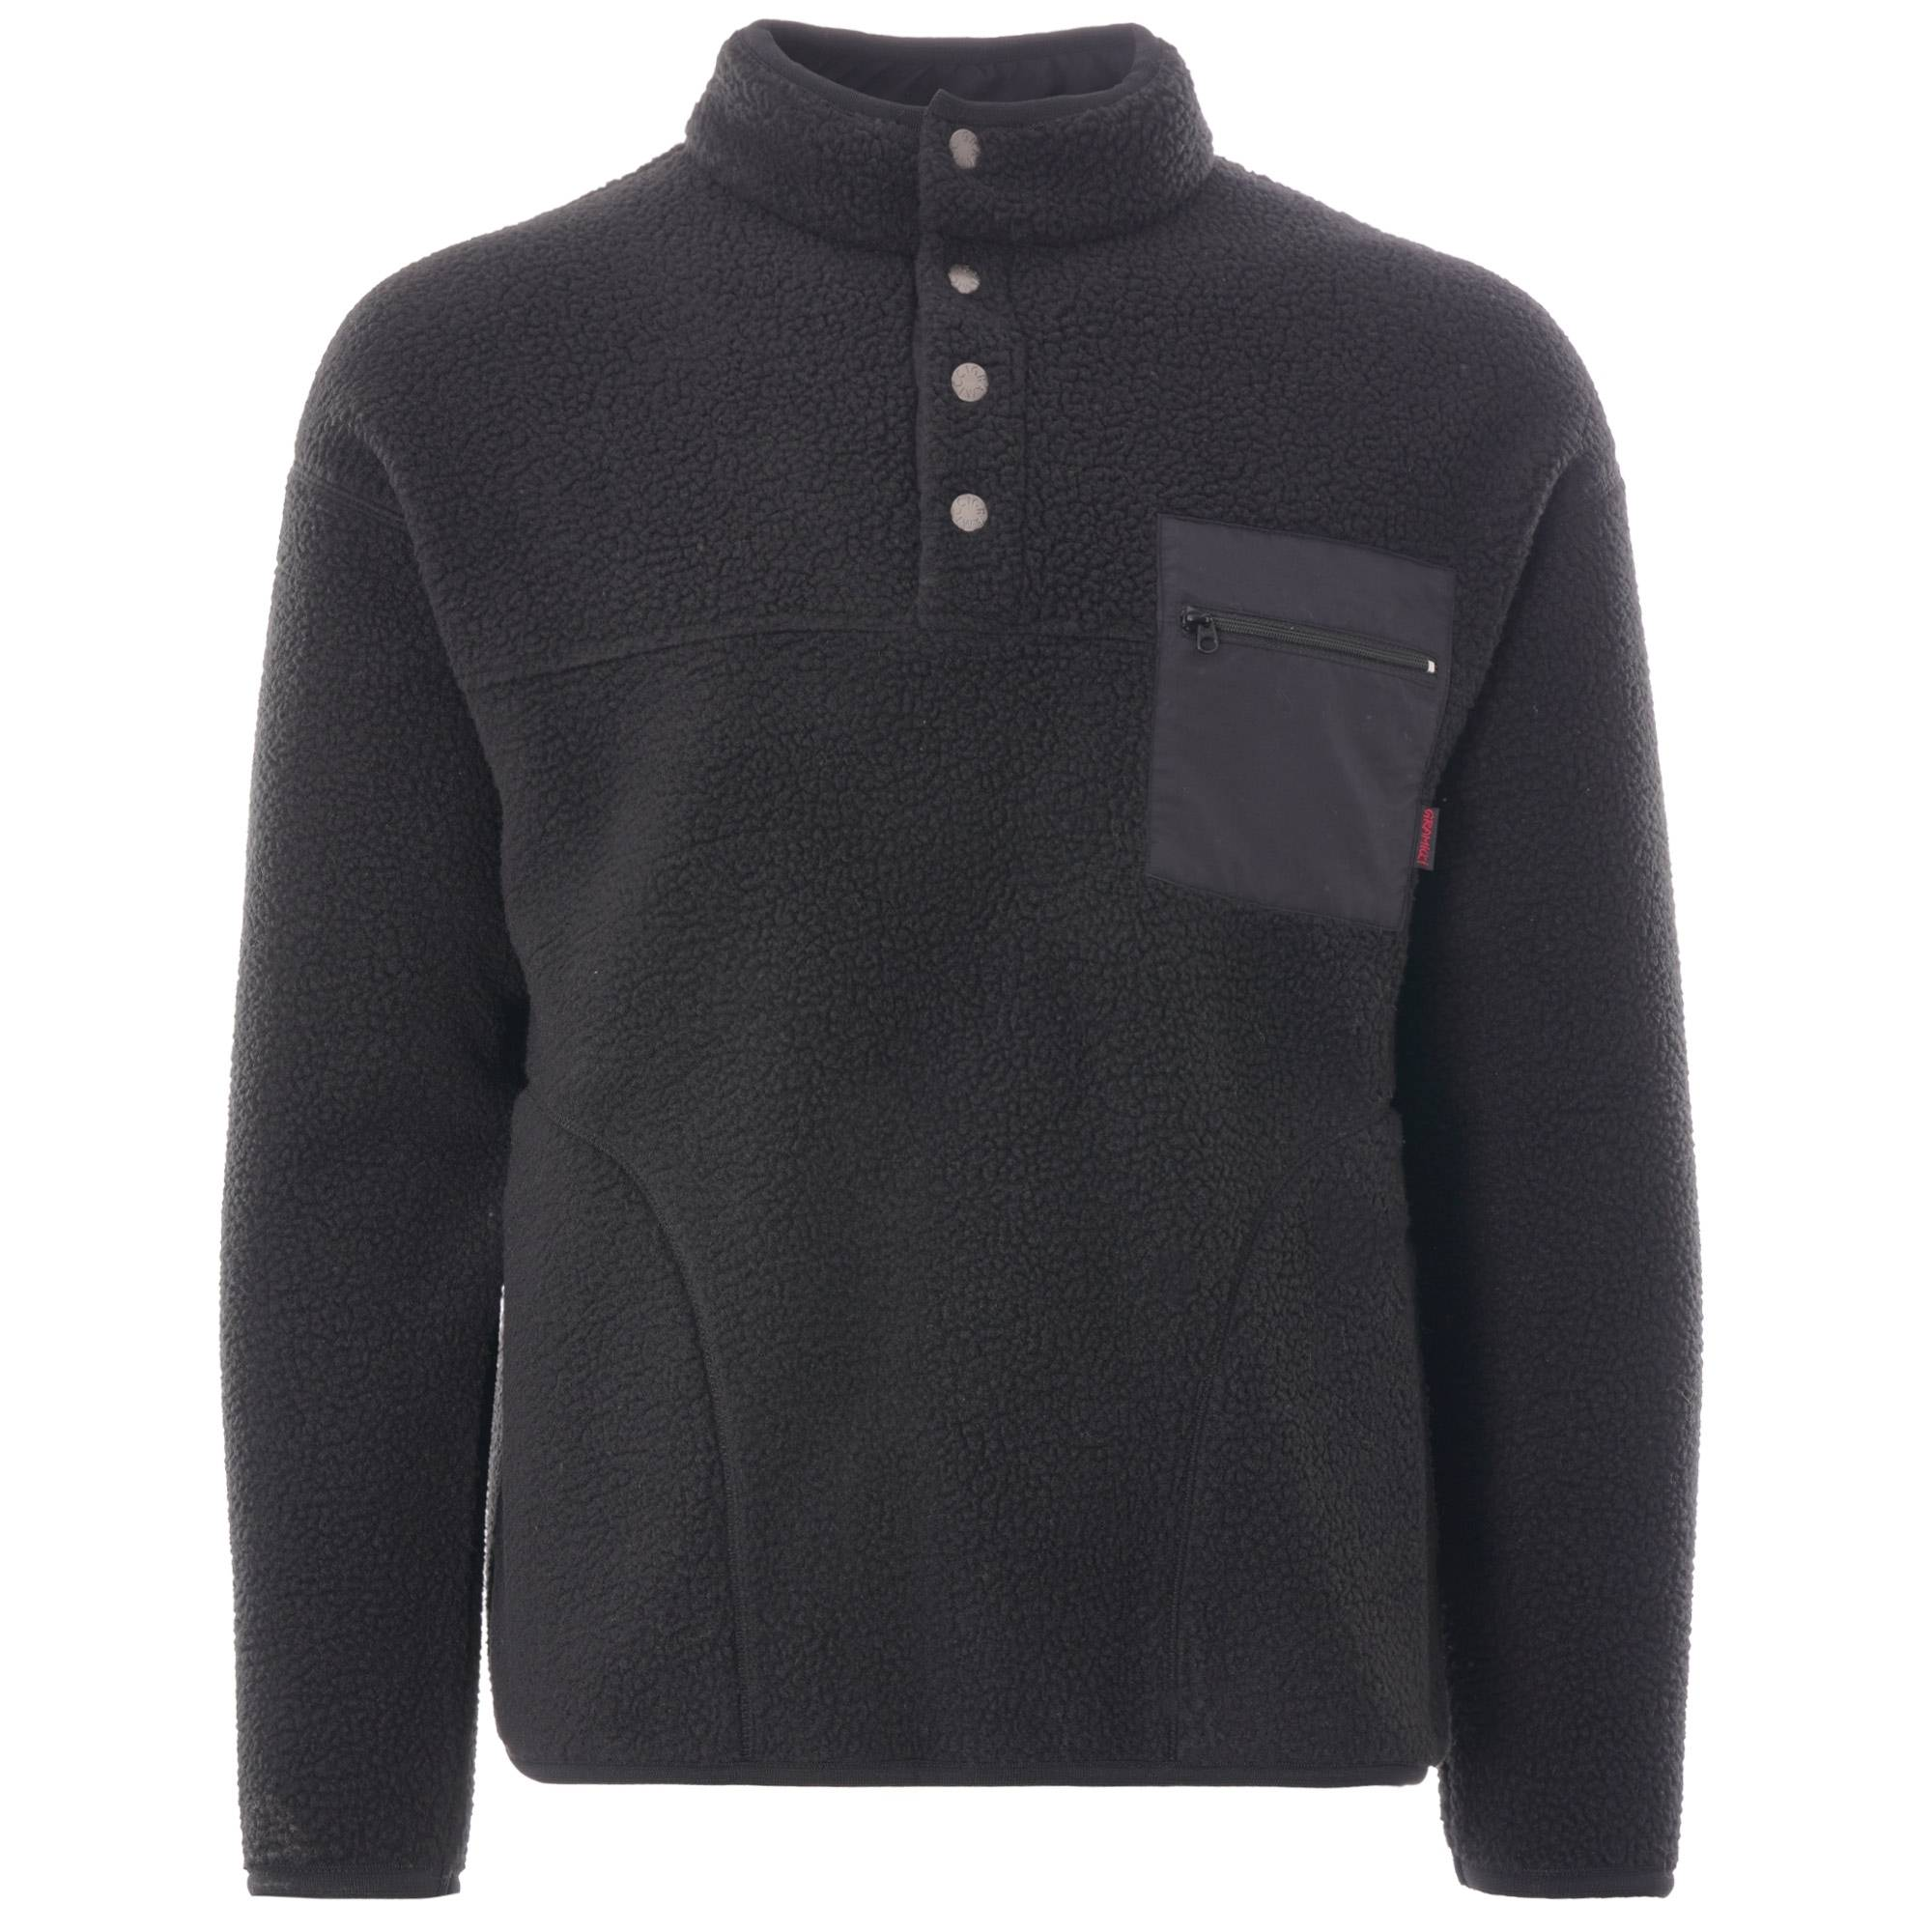 Gramicci Boa Fleece Zip Jacket   Black   GM-410843